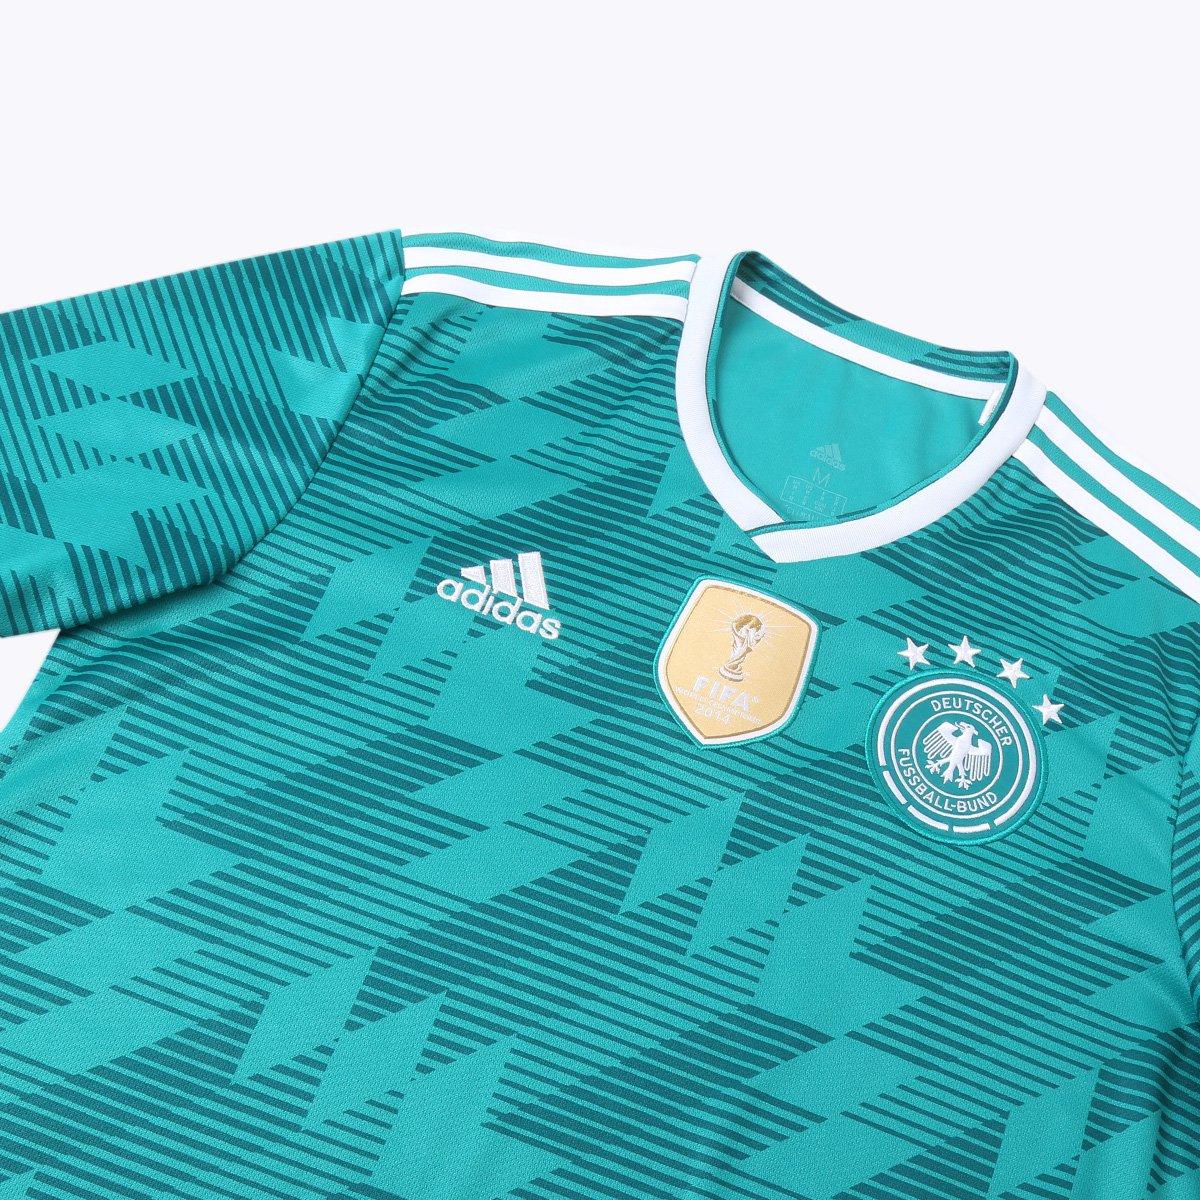 4bac05038a ... Camisa Seleção Alemanha Away 2018 n° 21 Gündogan - Torcedor Adidas  Masculina